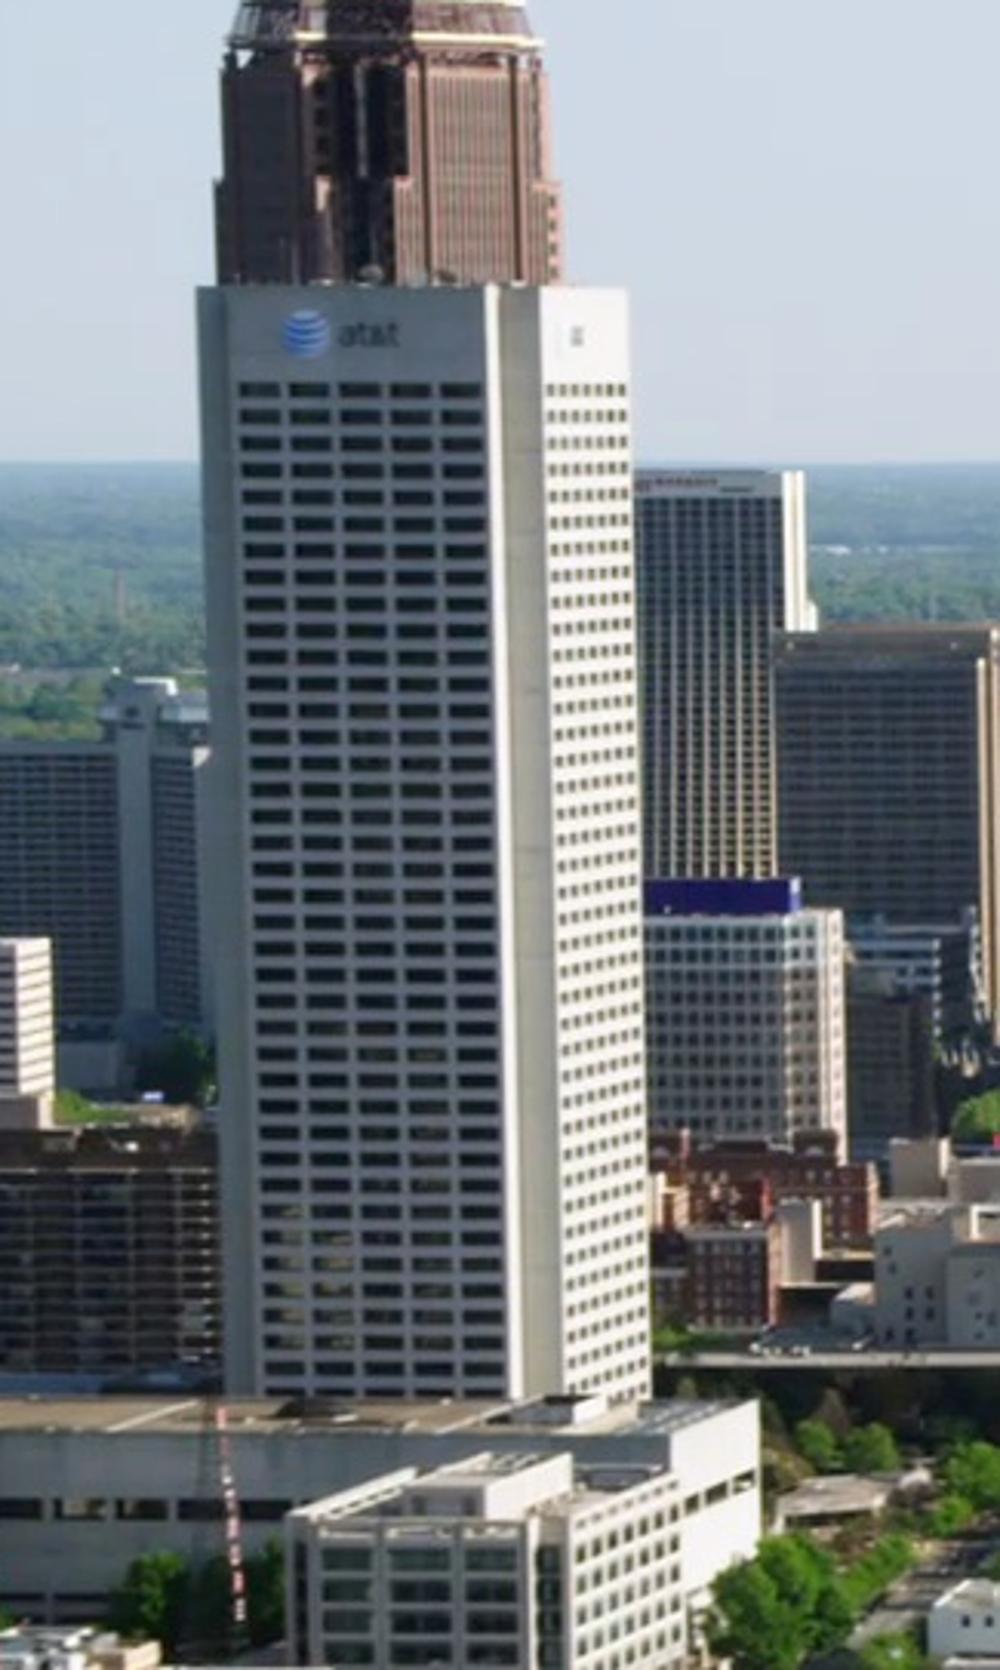 AT&T Midtown Center Atlanta, Georgia in Sabotage